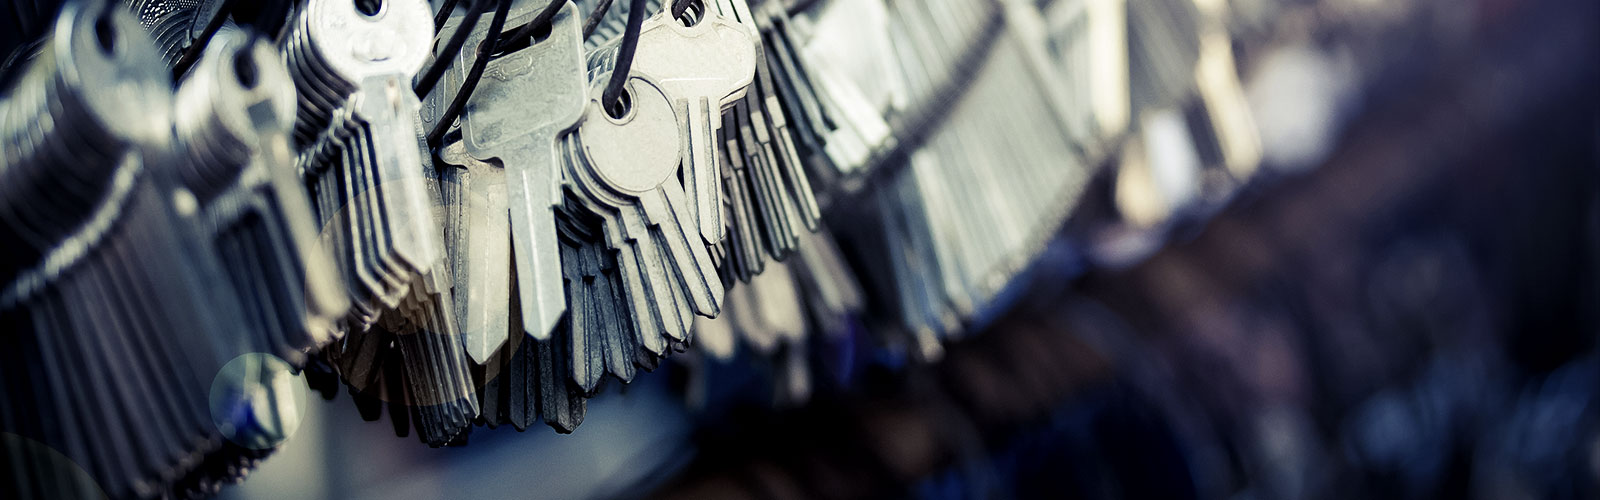 Jacksonville: Locksmith Service, Locksmiths and Automotive Locksmith